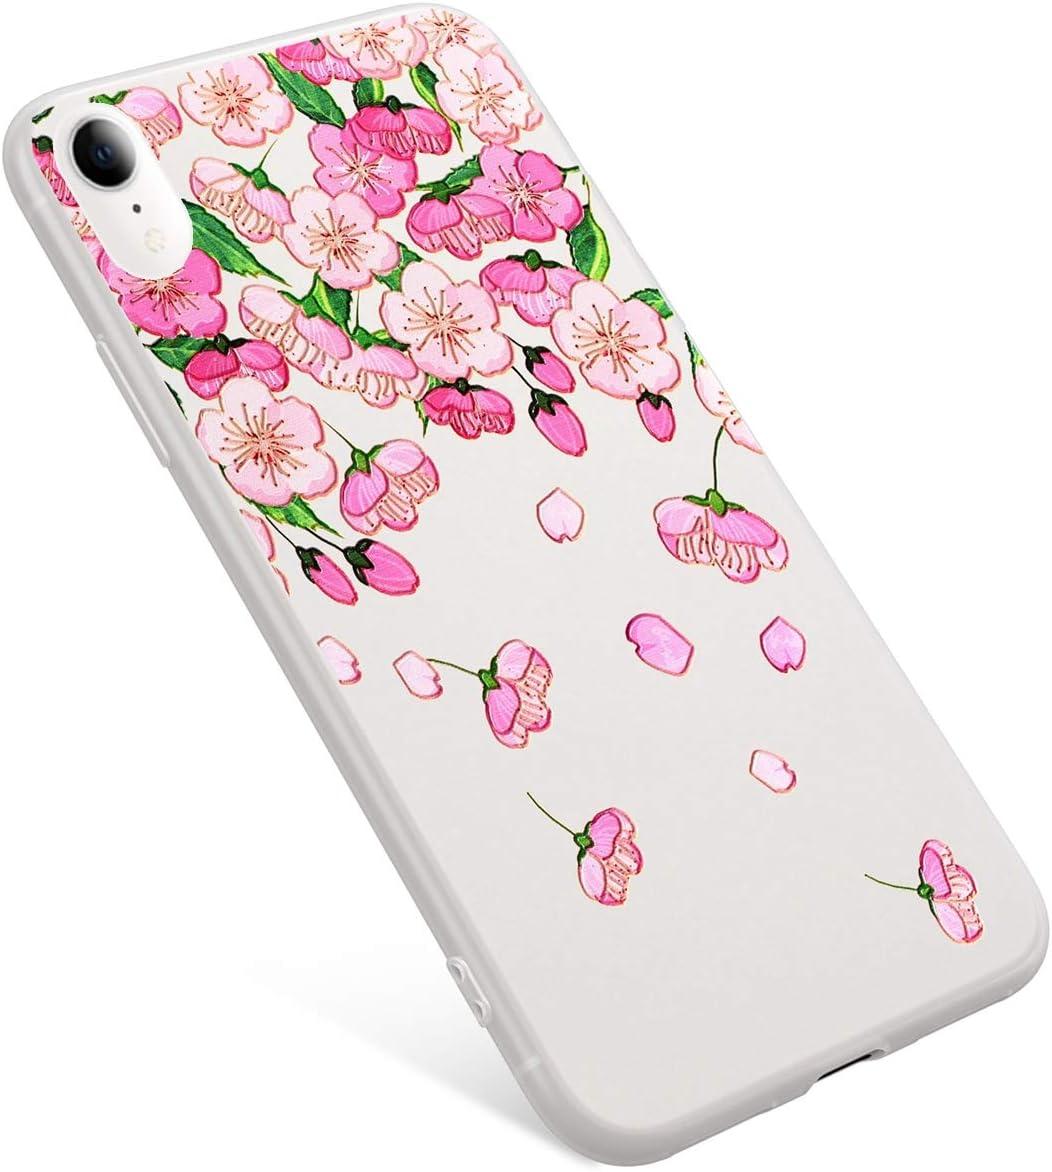 Sakura Uposao Funda iPhone XR Carcasa Scrub Transparente Dibujos